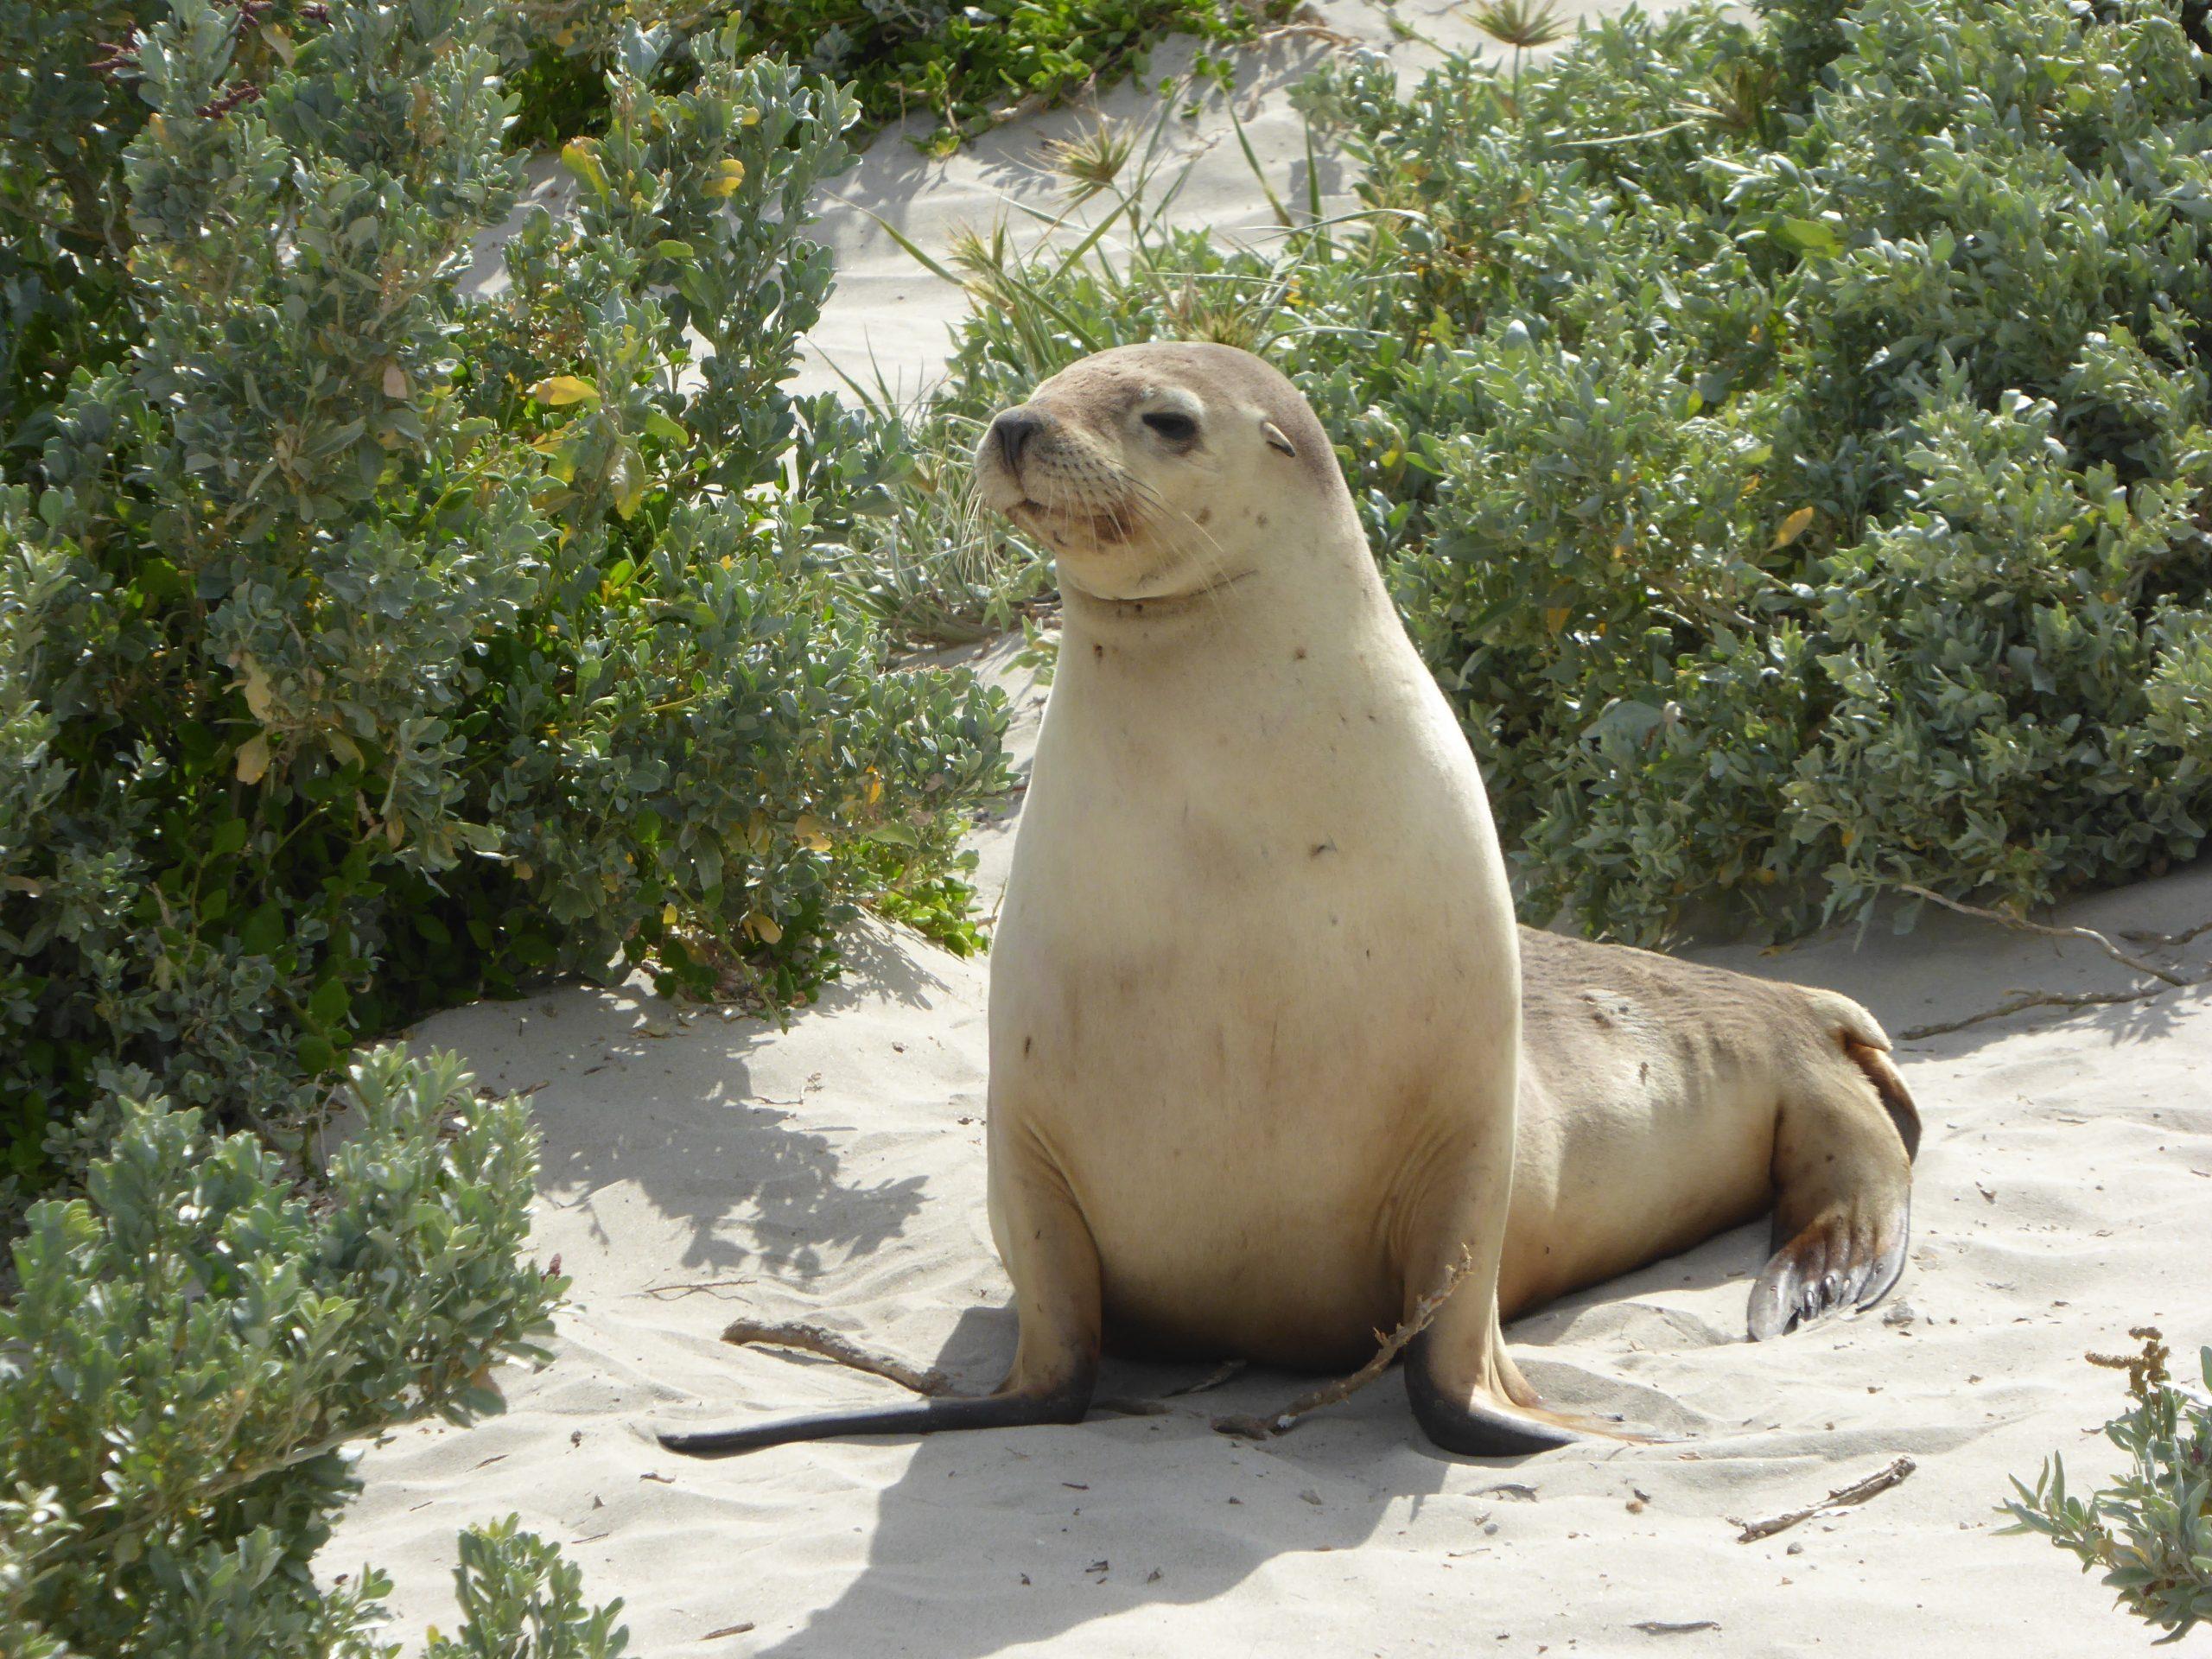 Radreise Australien 2016 - Kangaroo Island - Seelöwe